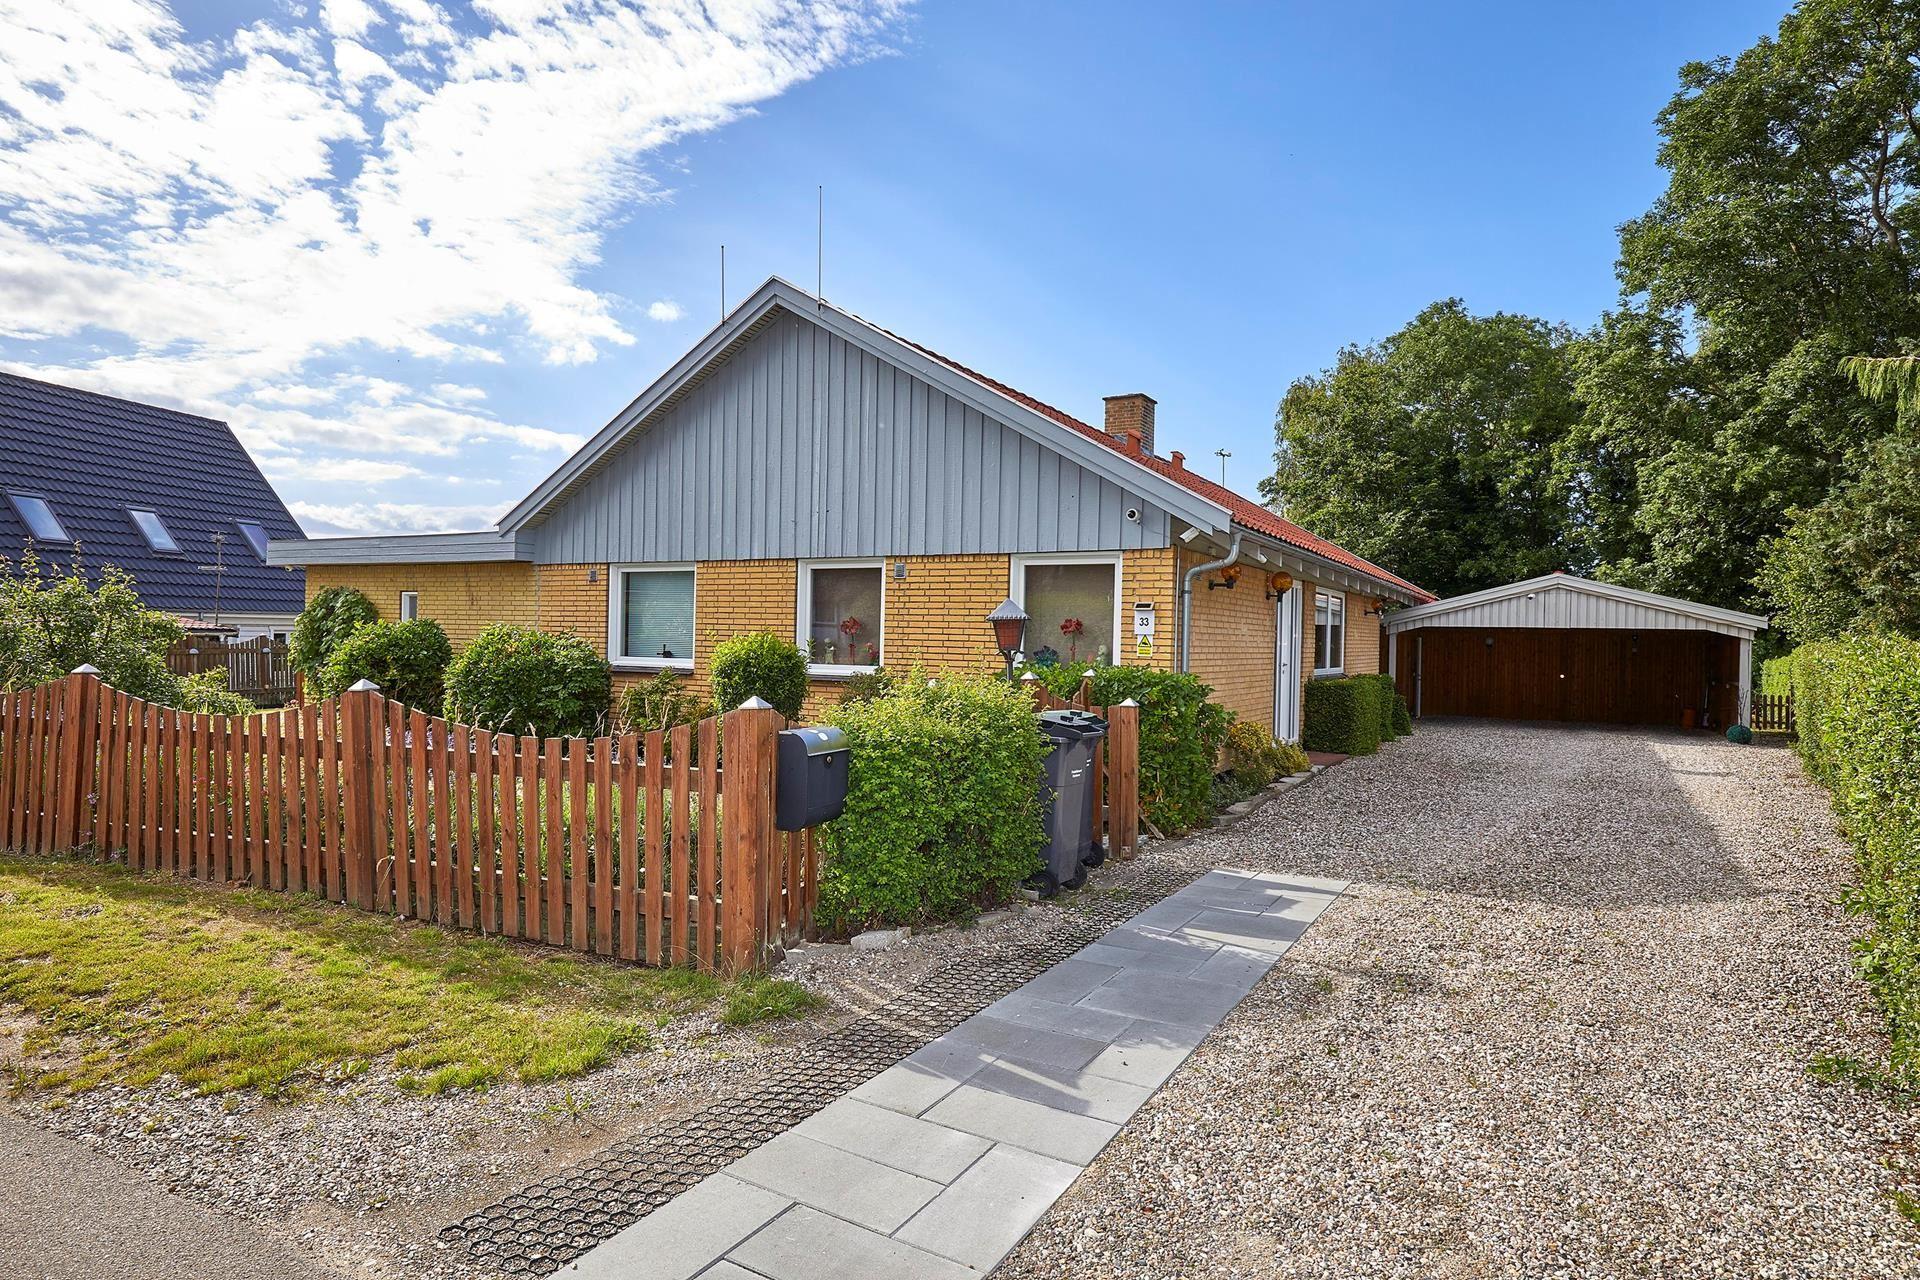 Enghaven 33, 3630 Jægerspris